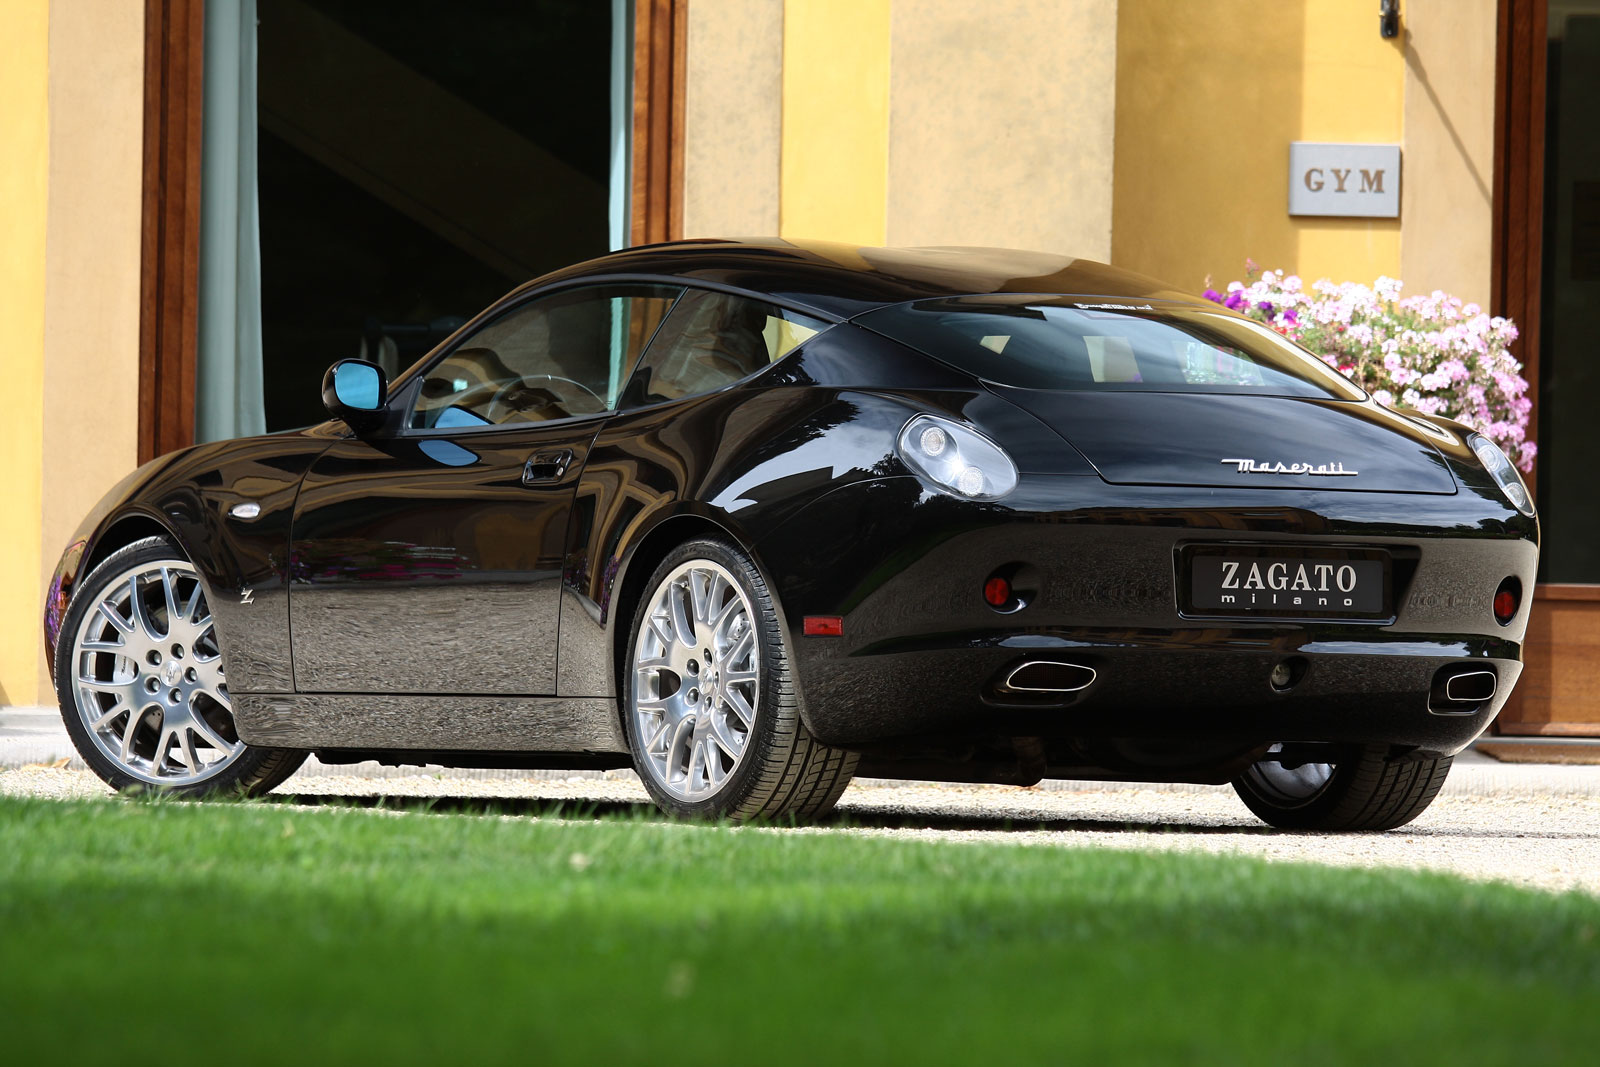 http://www.carbodydesign.com/media/2015/05/2007-Maserati-GS-Zagato-01.jpg